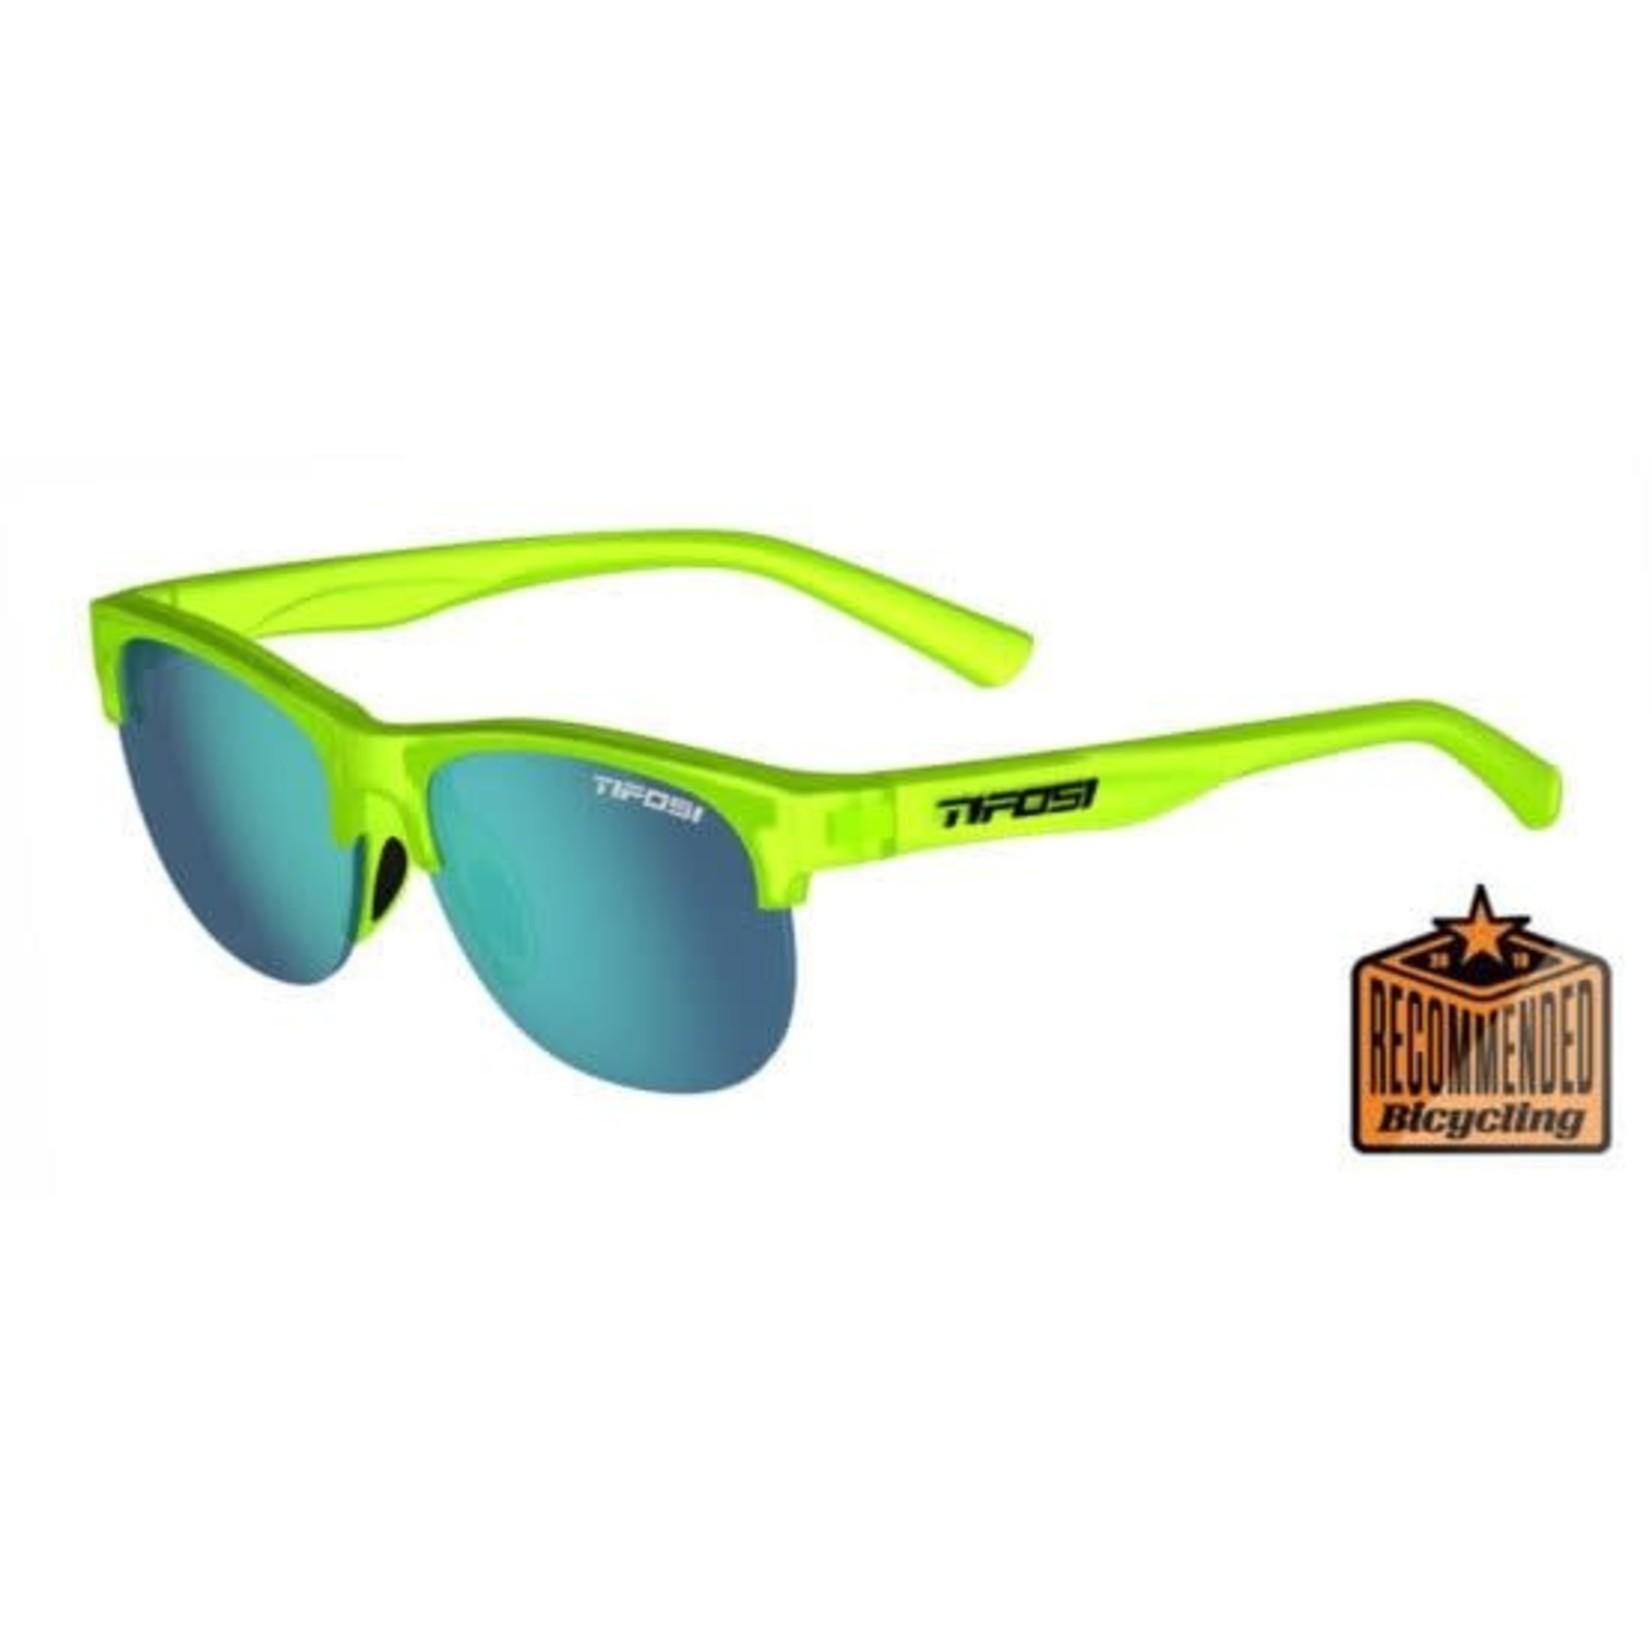 Tifosi Optics Swank SL, Satin Electric Green Single Lens Sunglasses